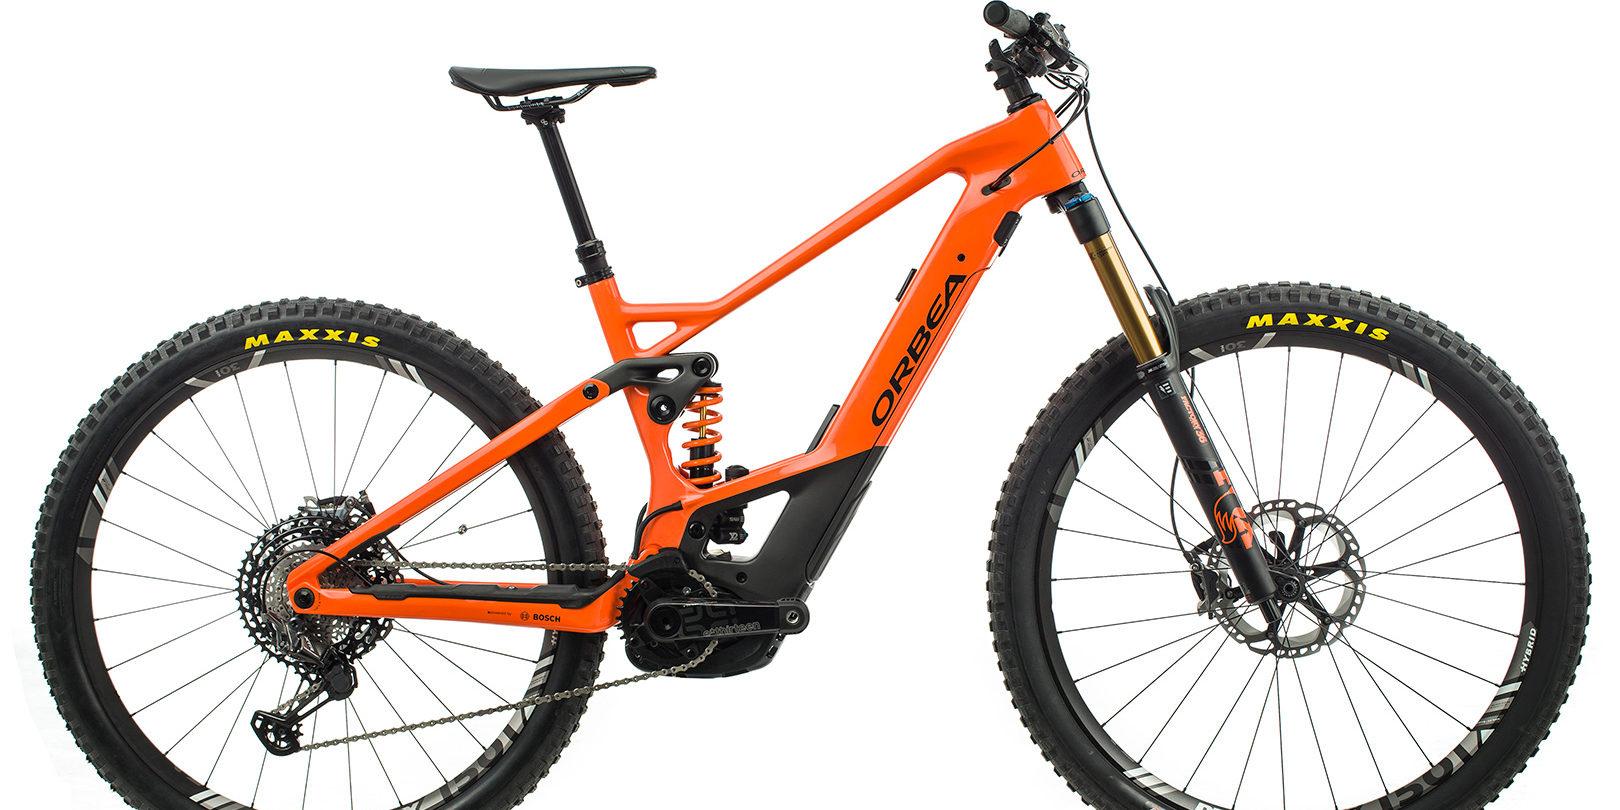 ORBEA WILD FS MLTD ebike - ORANJE (GLOSS) / ZWART (DOF) @G-Bikes